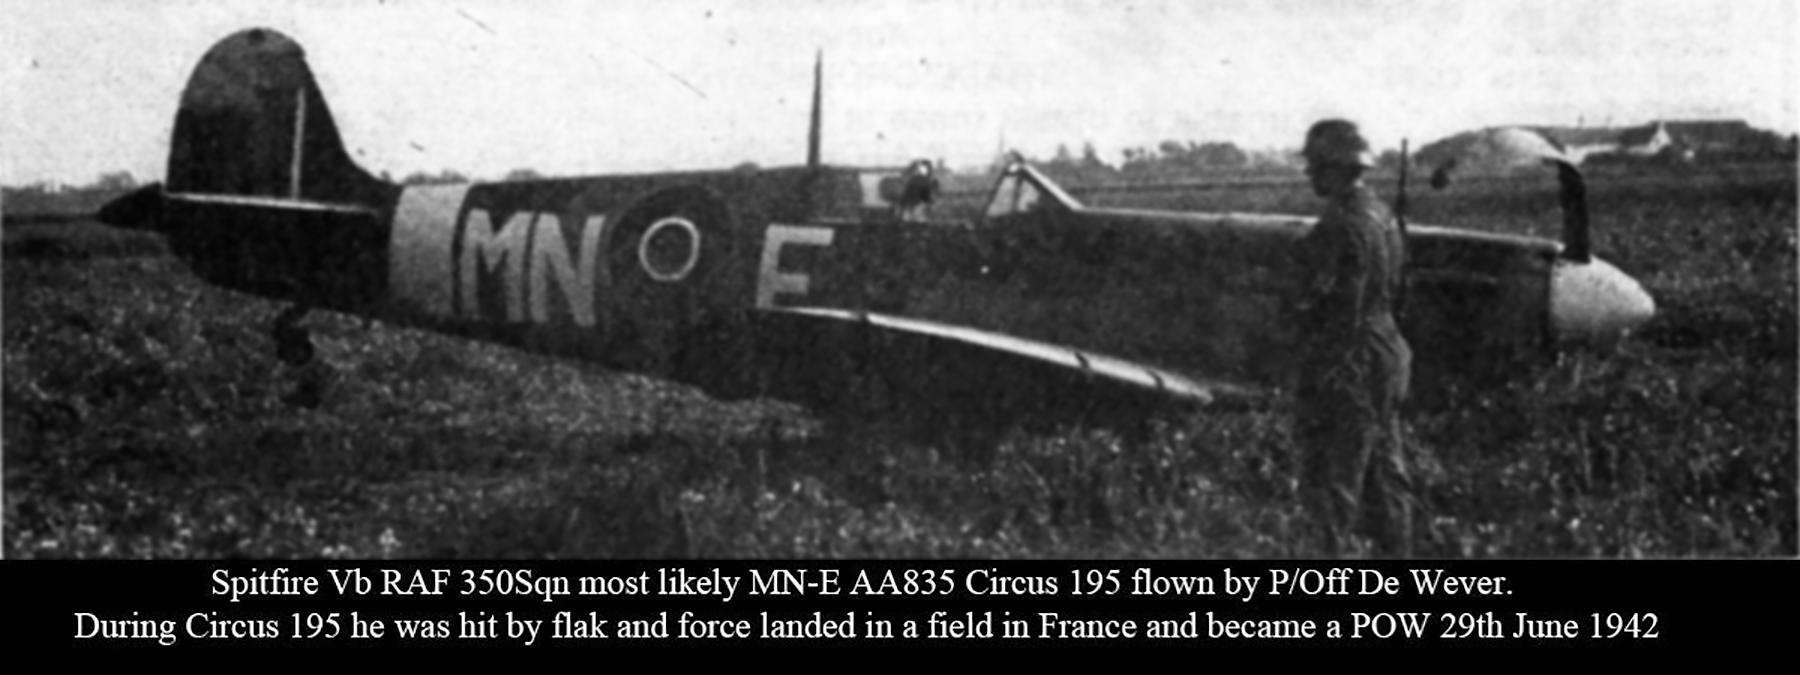 Spitfire MkVb RAF 350Sqn MNE AA835 Circus 195 De Wever POW shot down by flak 29th June 1942 01